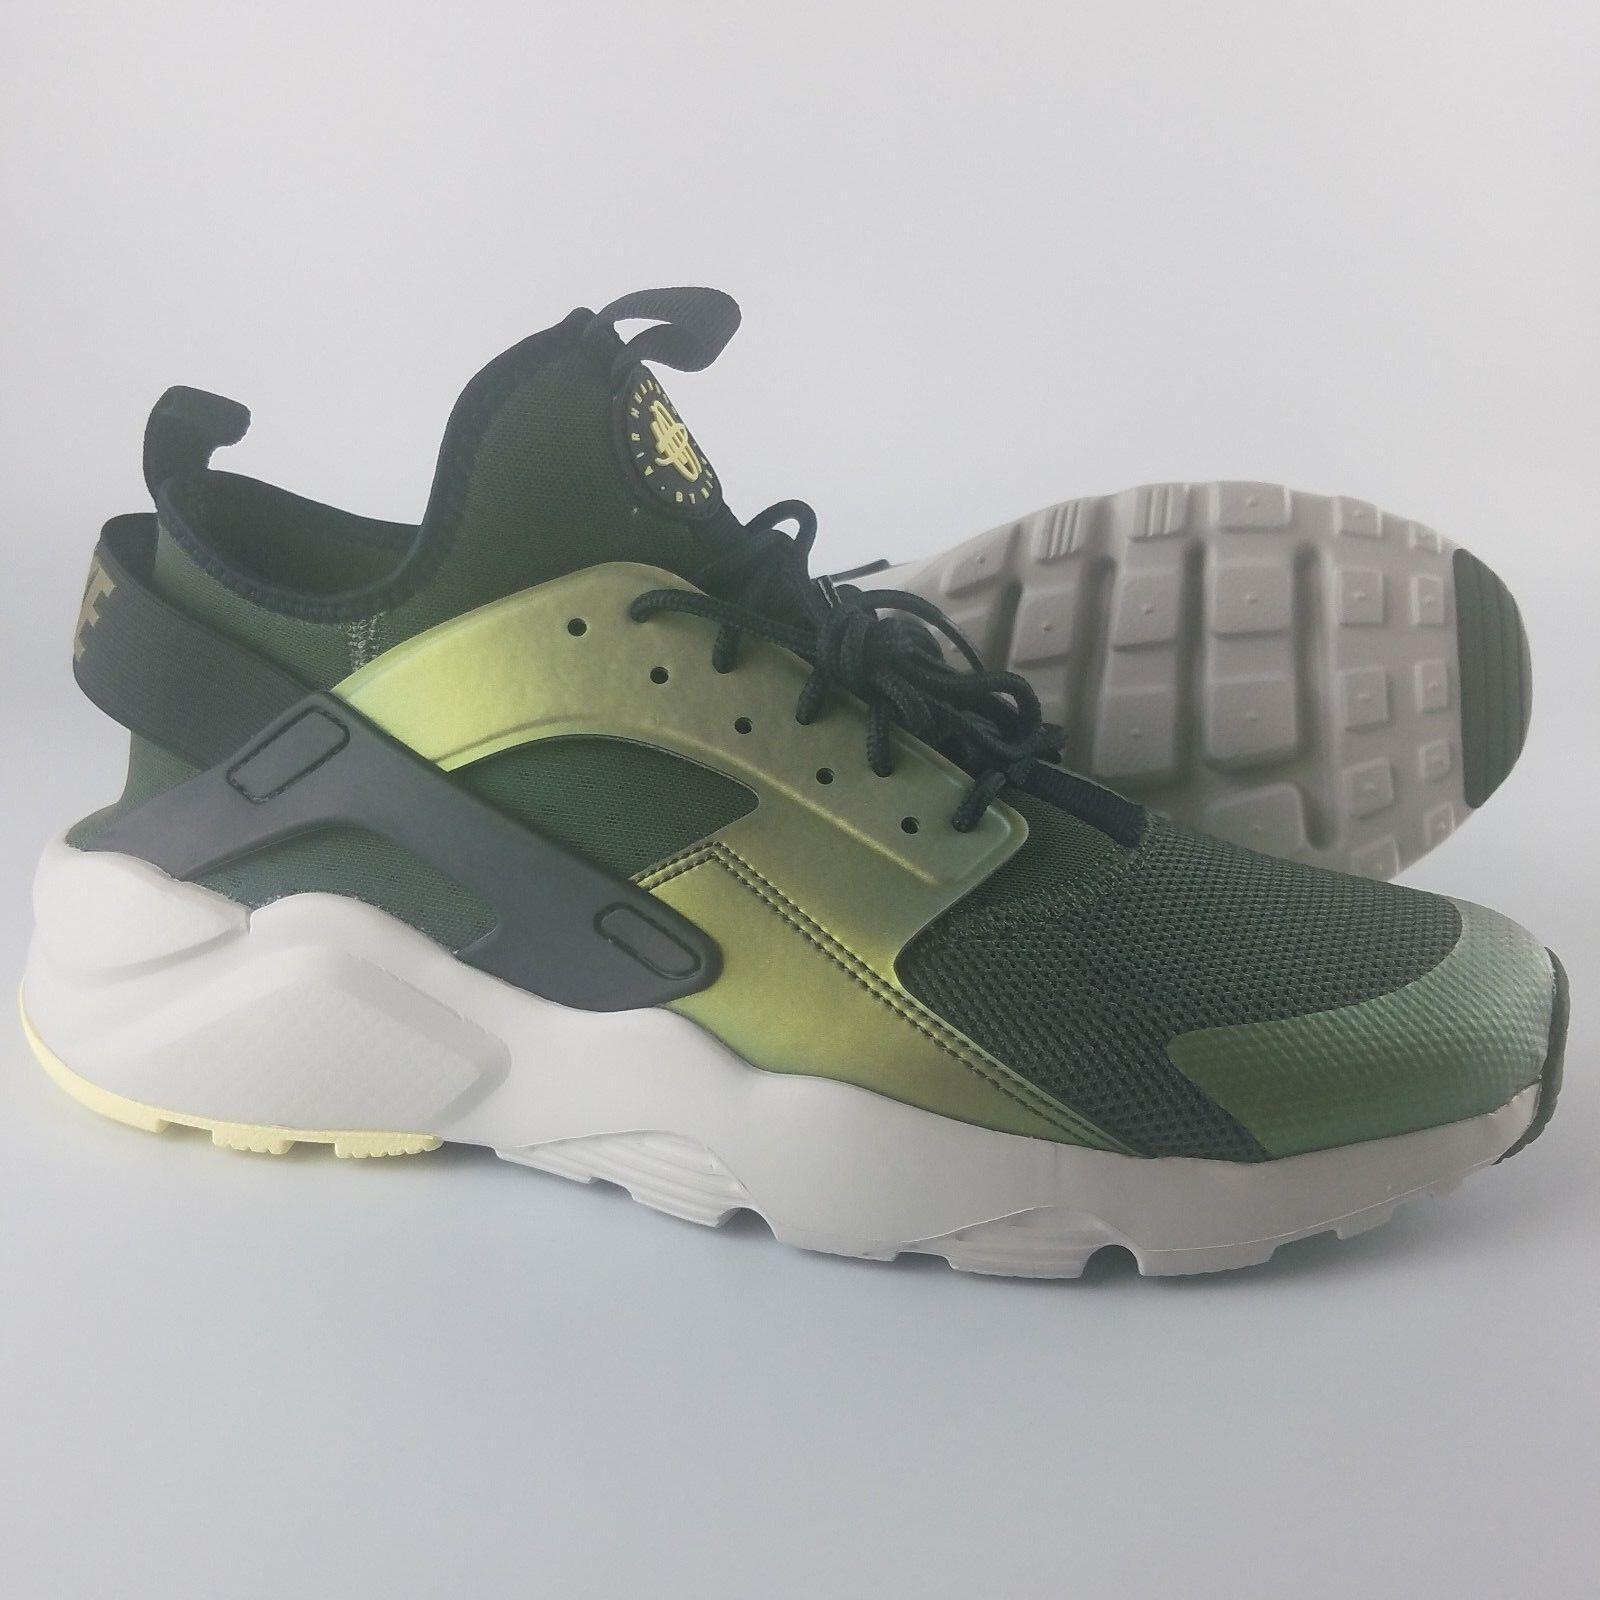 Nike Air Huarache Run Ultra SE Men's Cross Training shoes Sequoia Black Lgt Bone